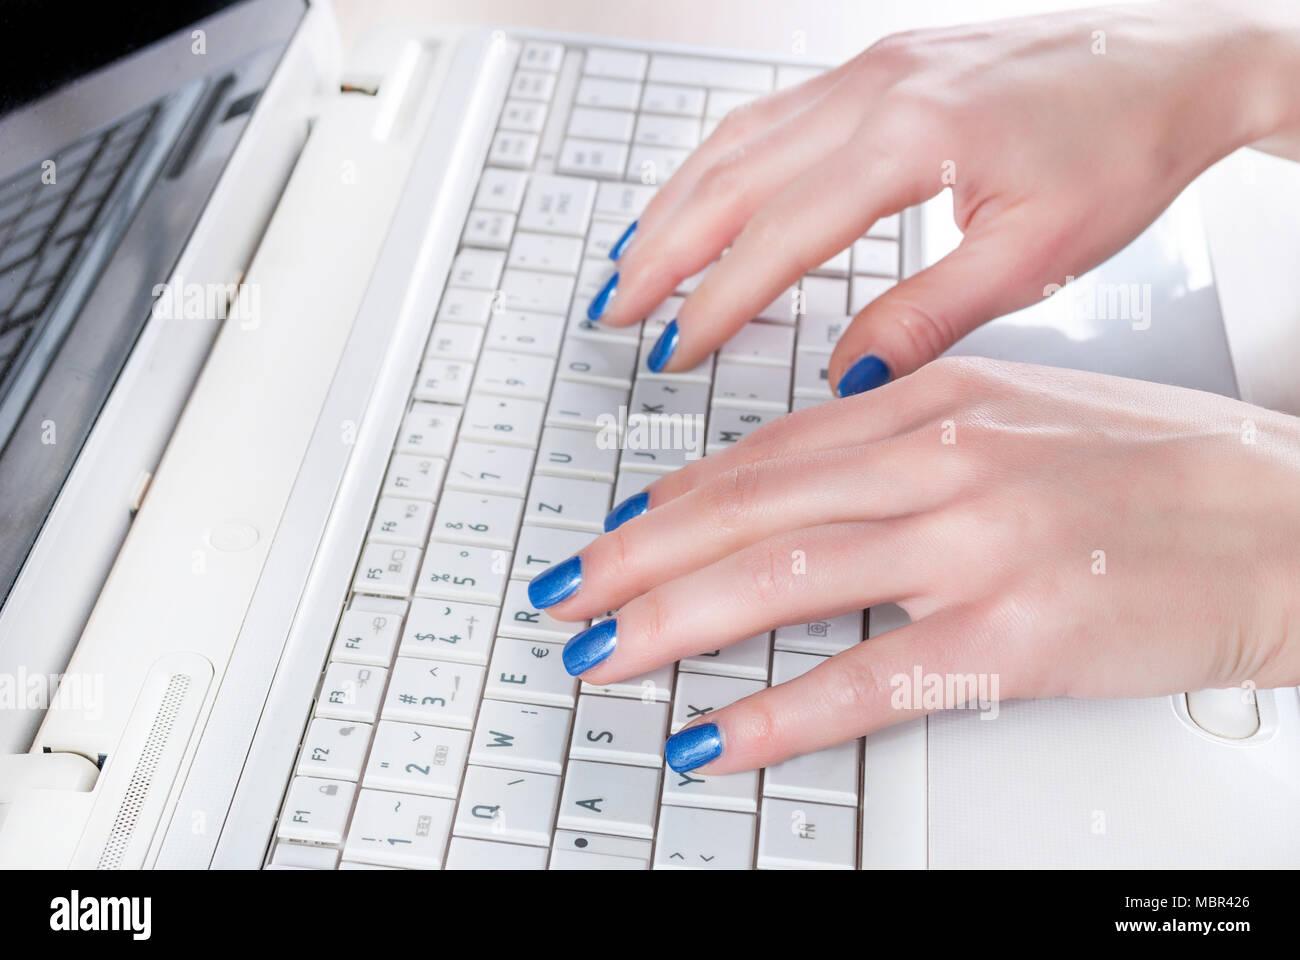 Blue Nails Stockfotos & Blue Nails Bilder - Alamy